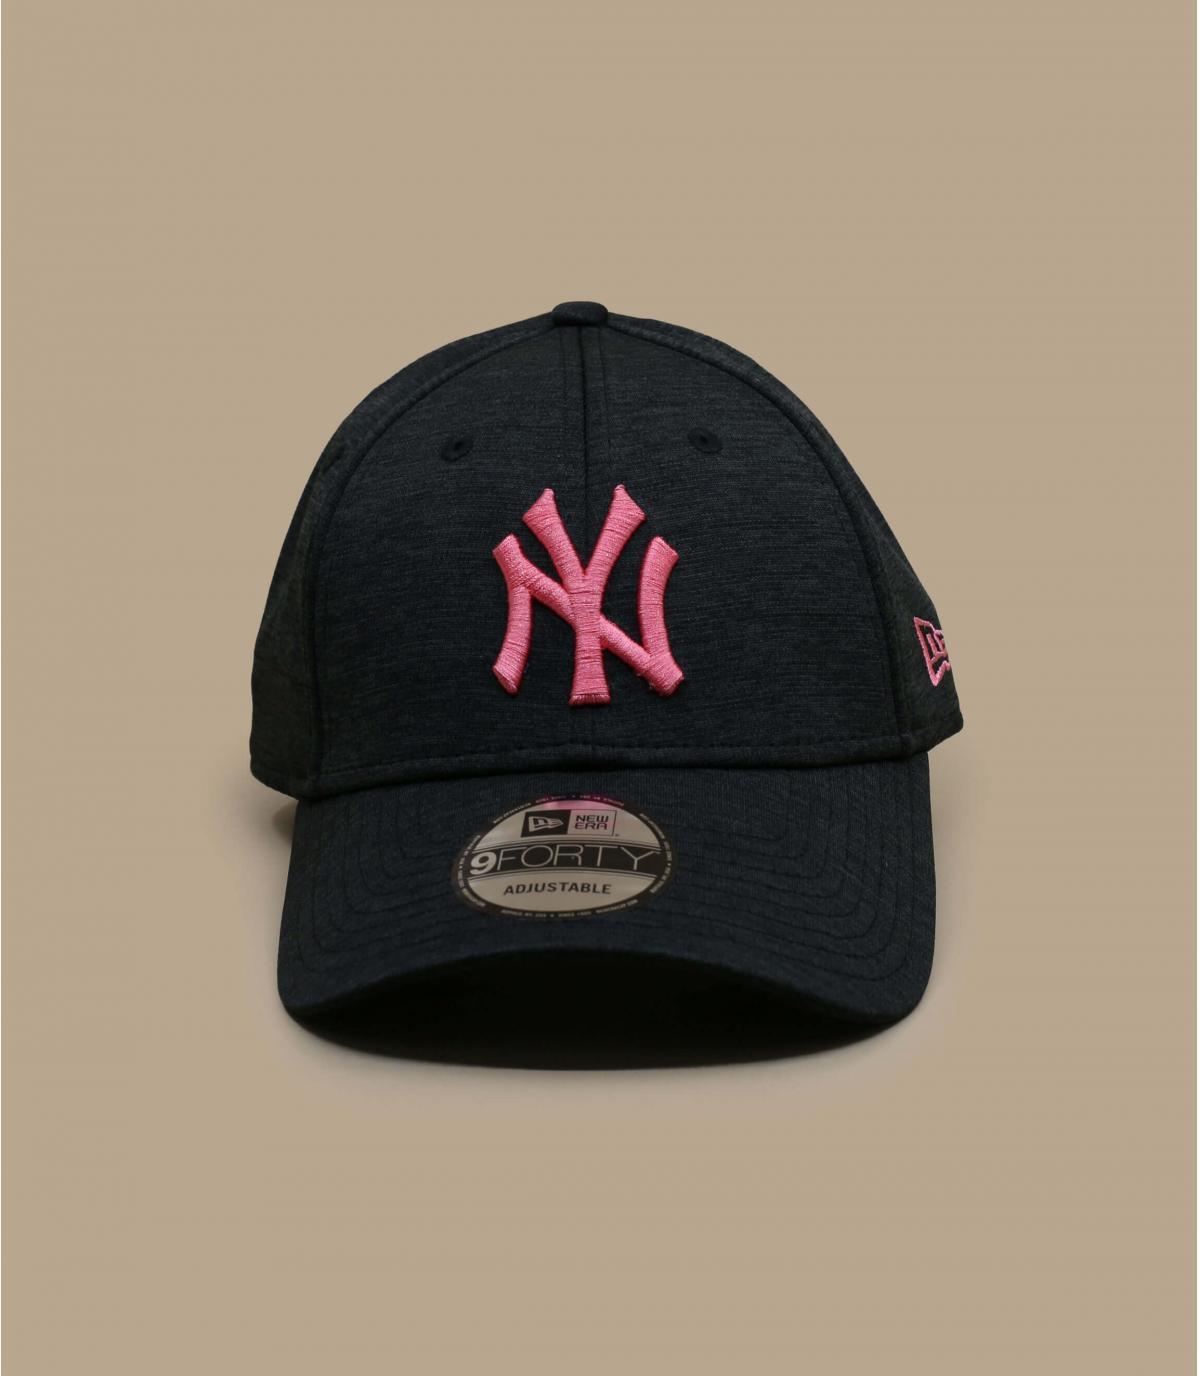 casquette NY noir rose